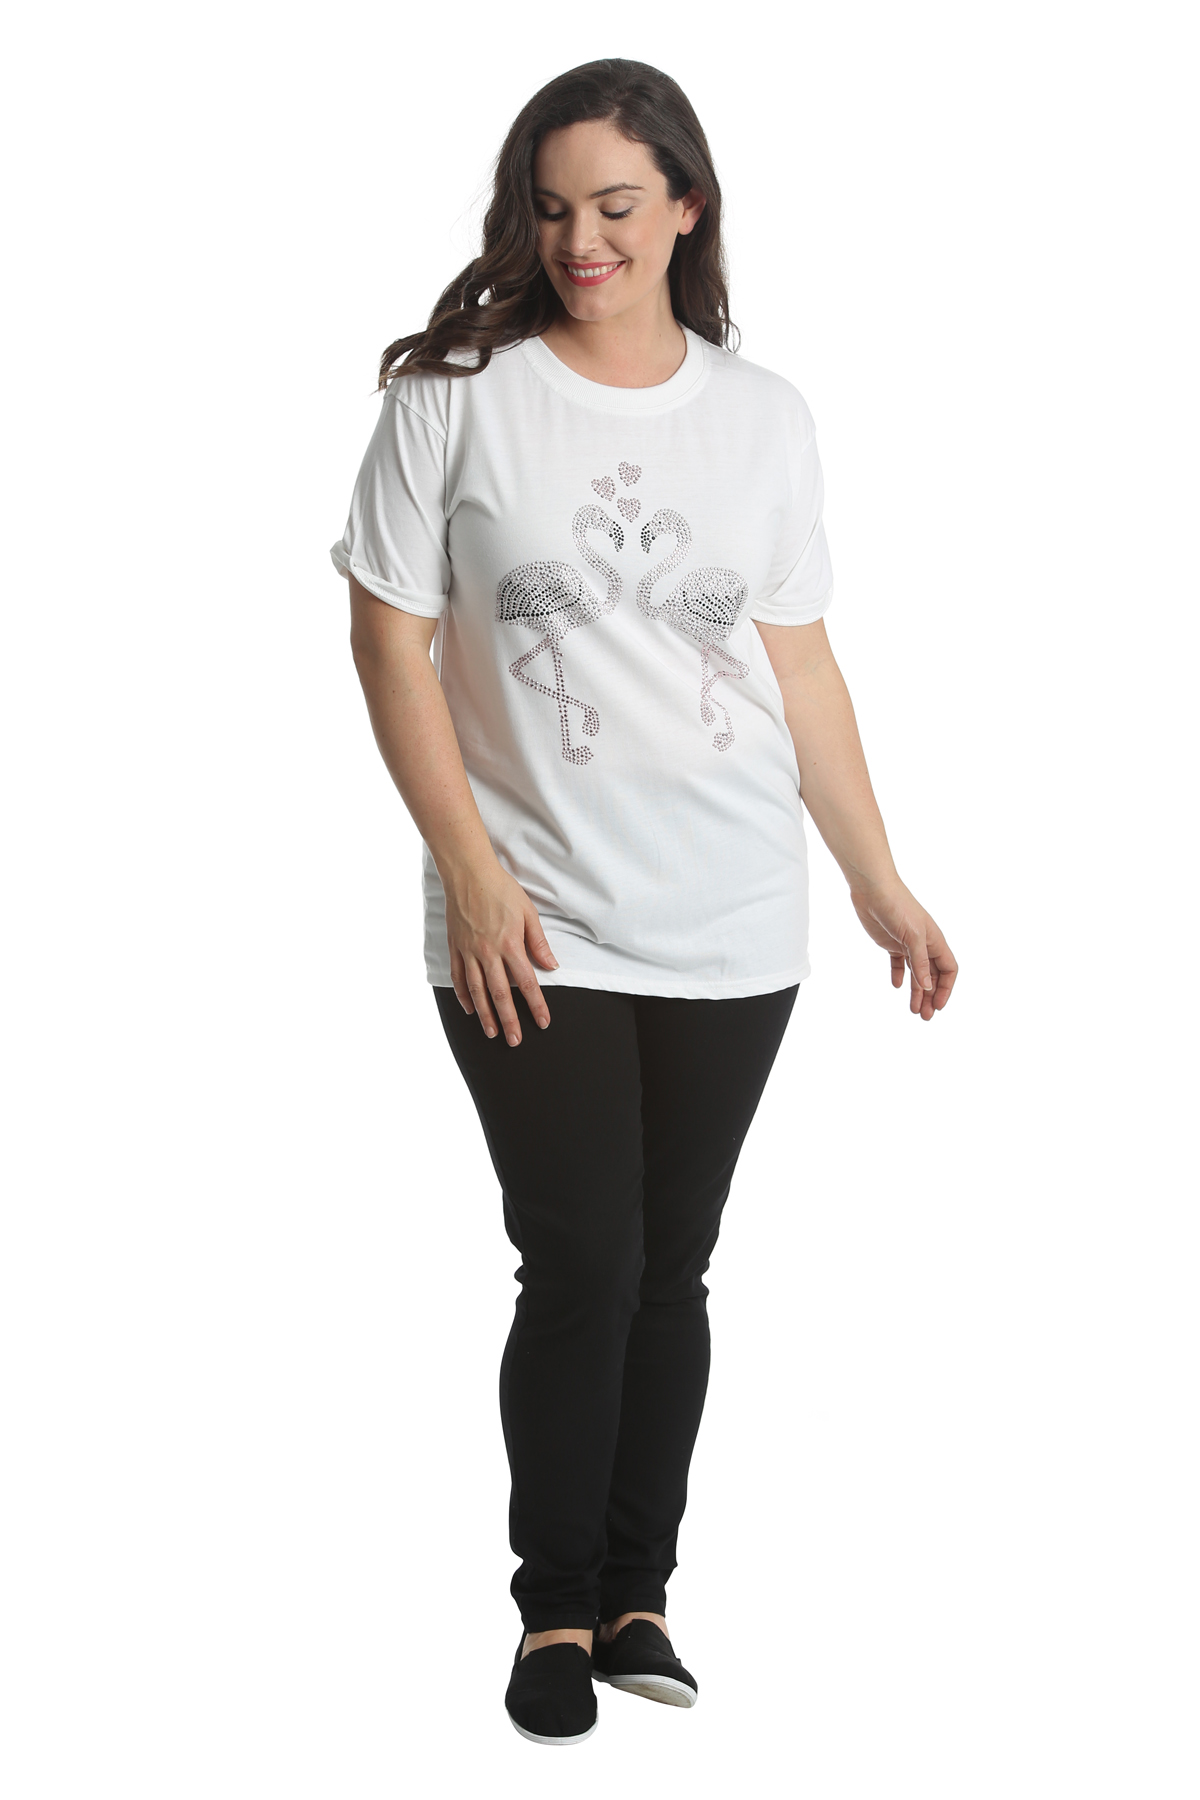 682b344a New Ladies Plus Size Top Womens T-Shirt Flamingo Stud Bird ...